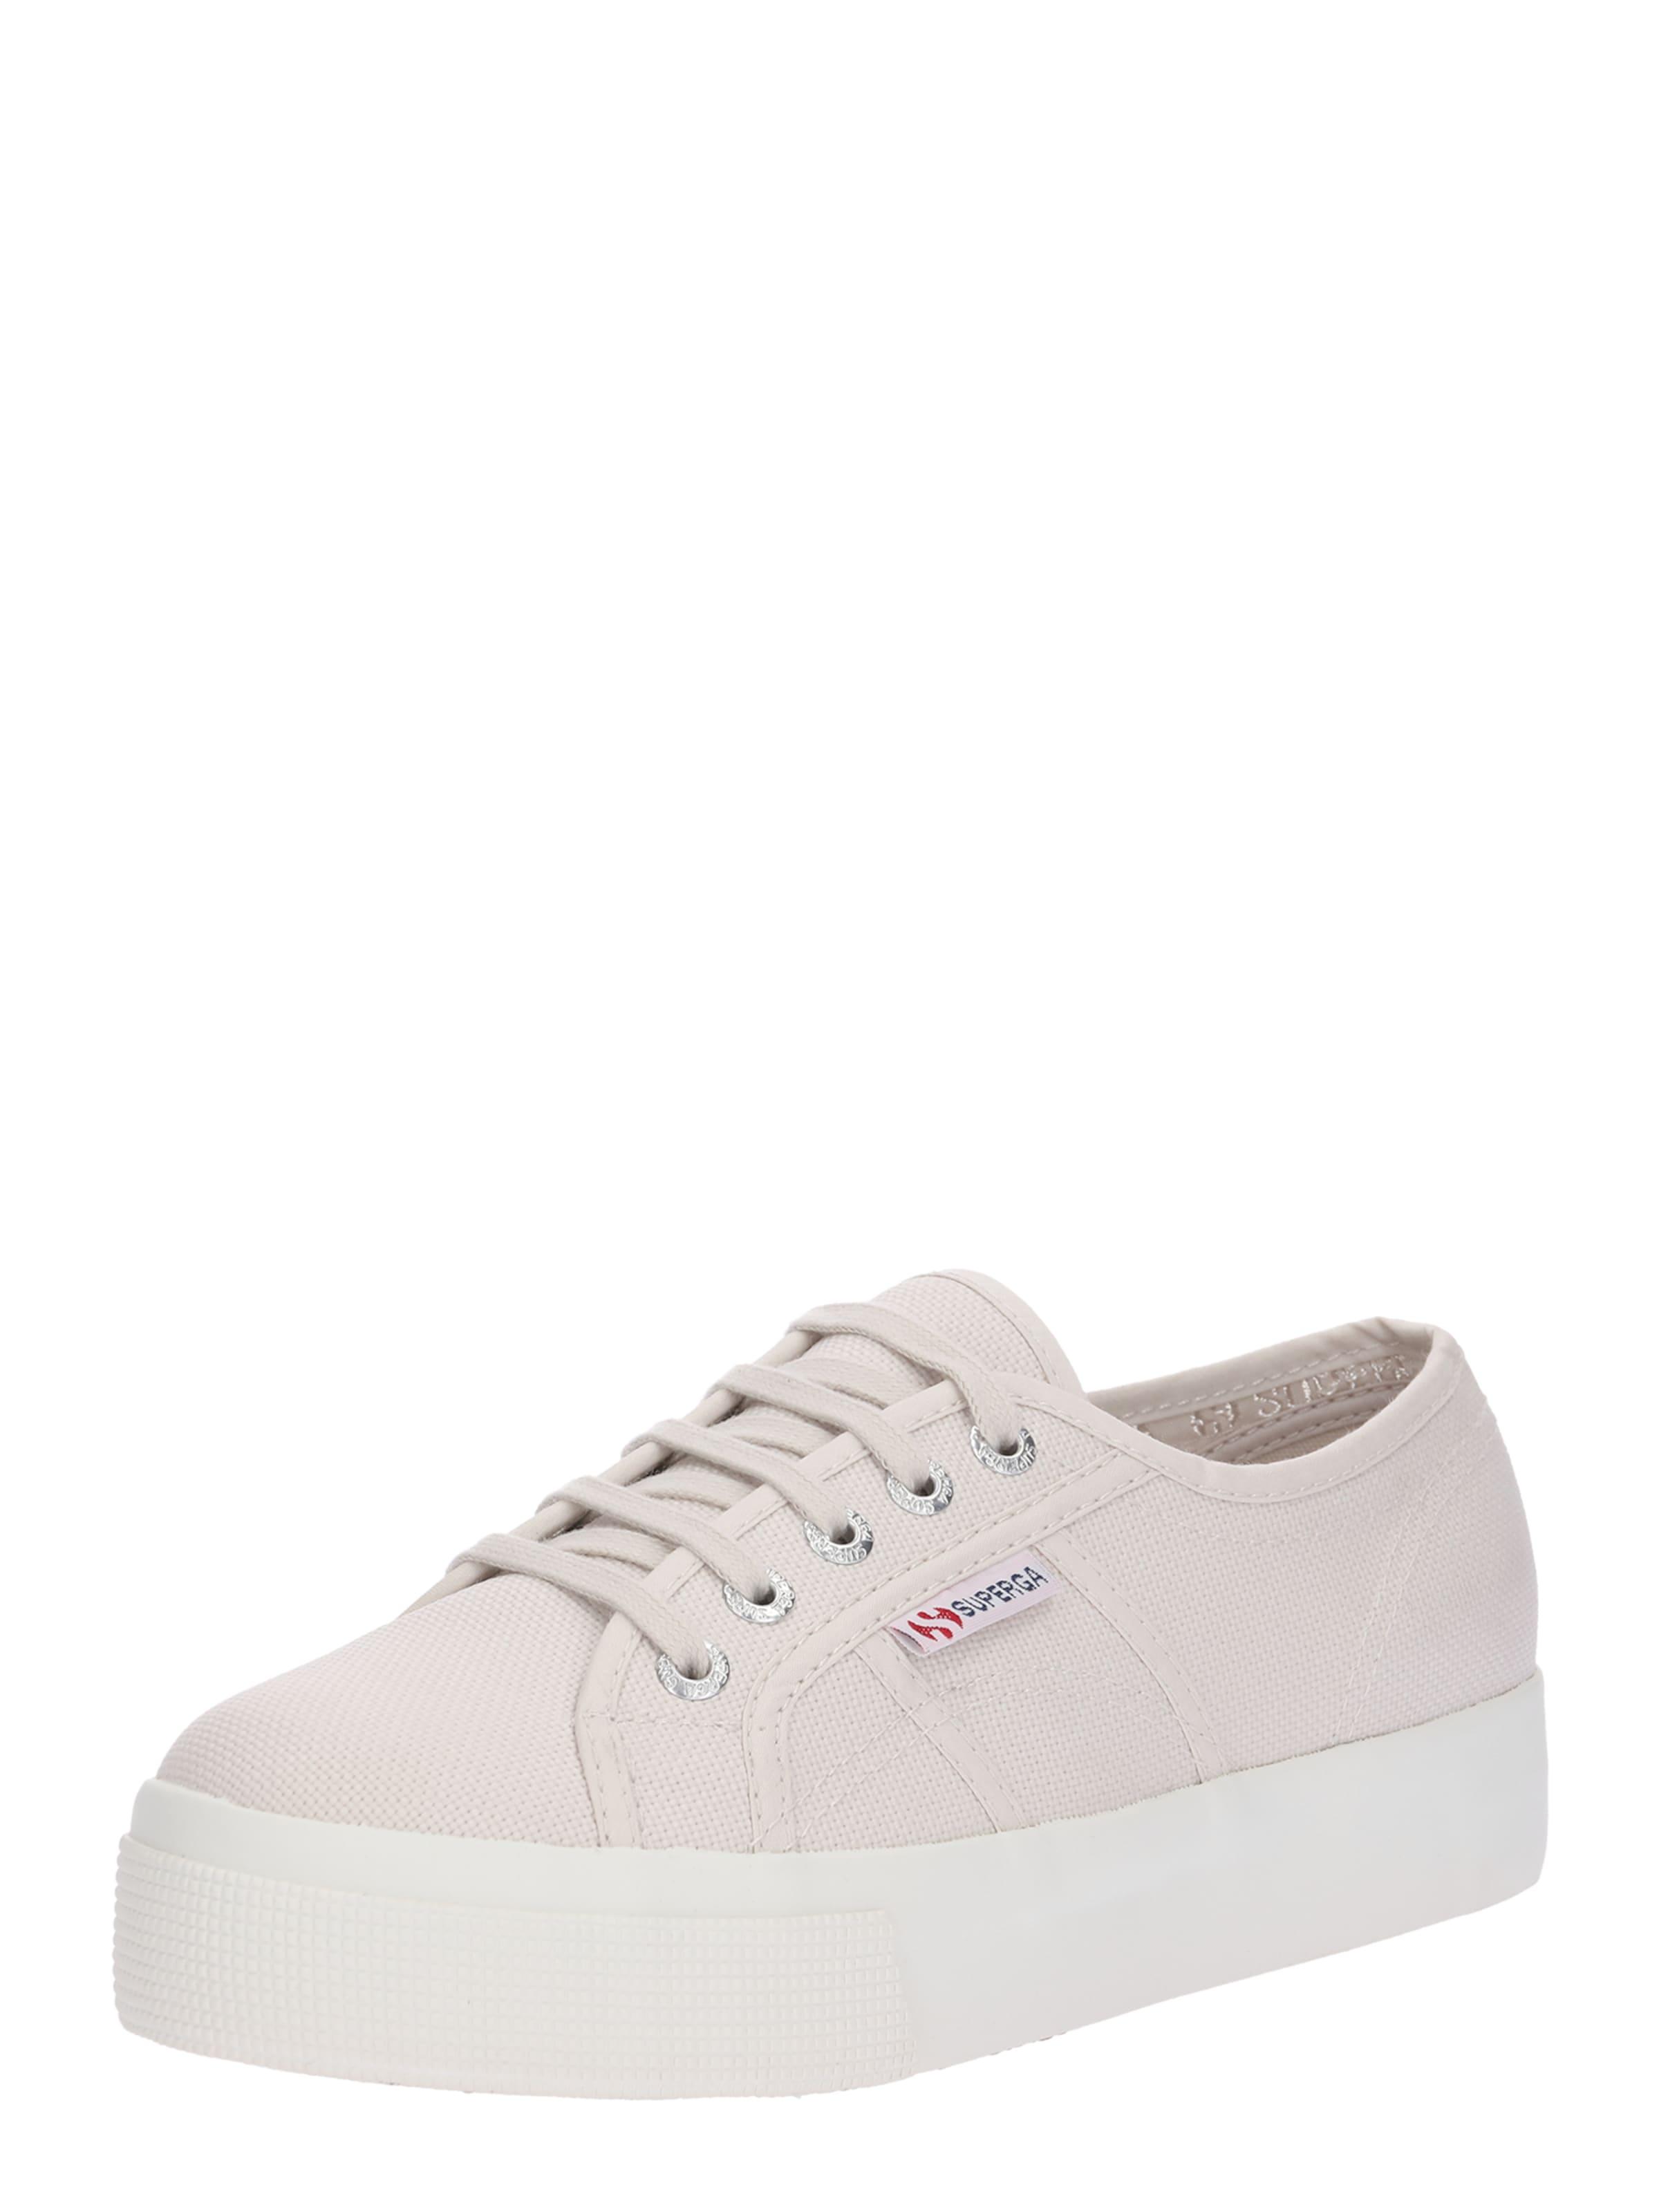 SUPERGA Sneaker Low mit Plateausohle Hohe Qualität